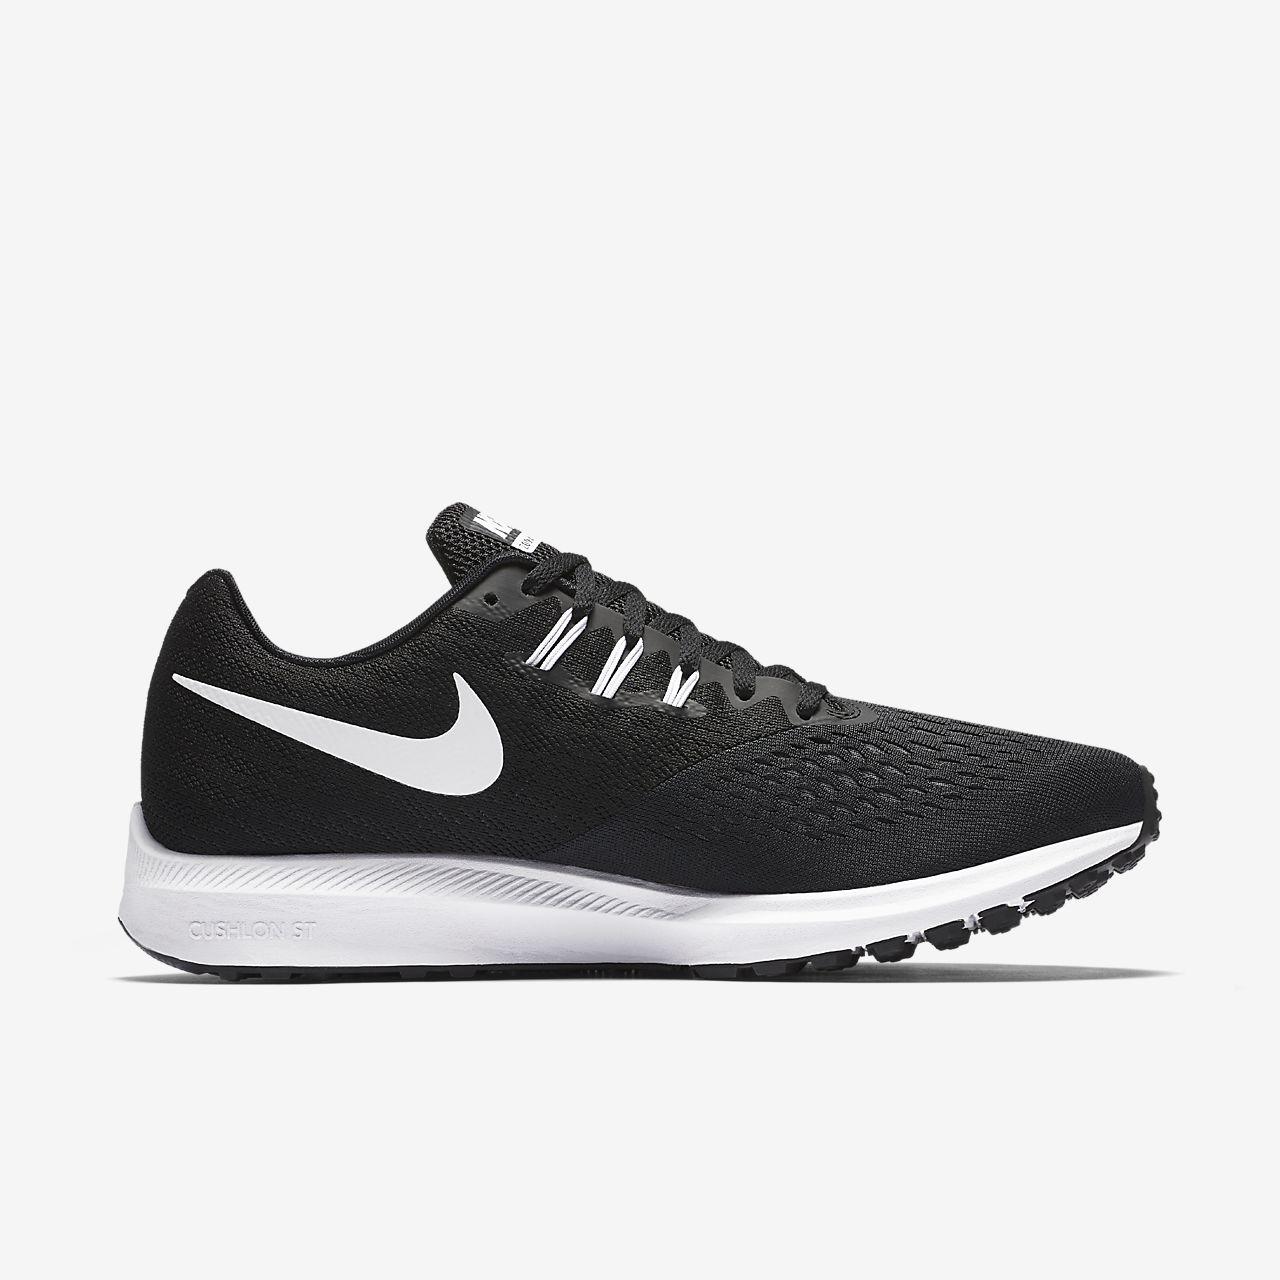 ... Nike Zoom Winflo 4 Herren-Laufschuh